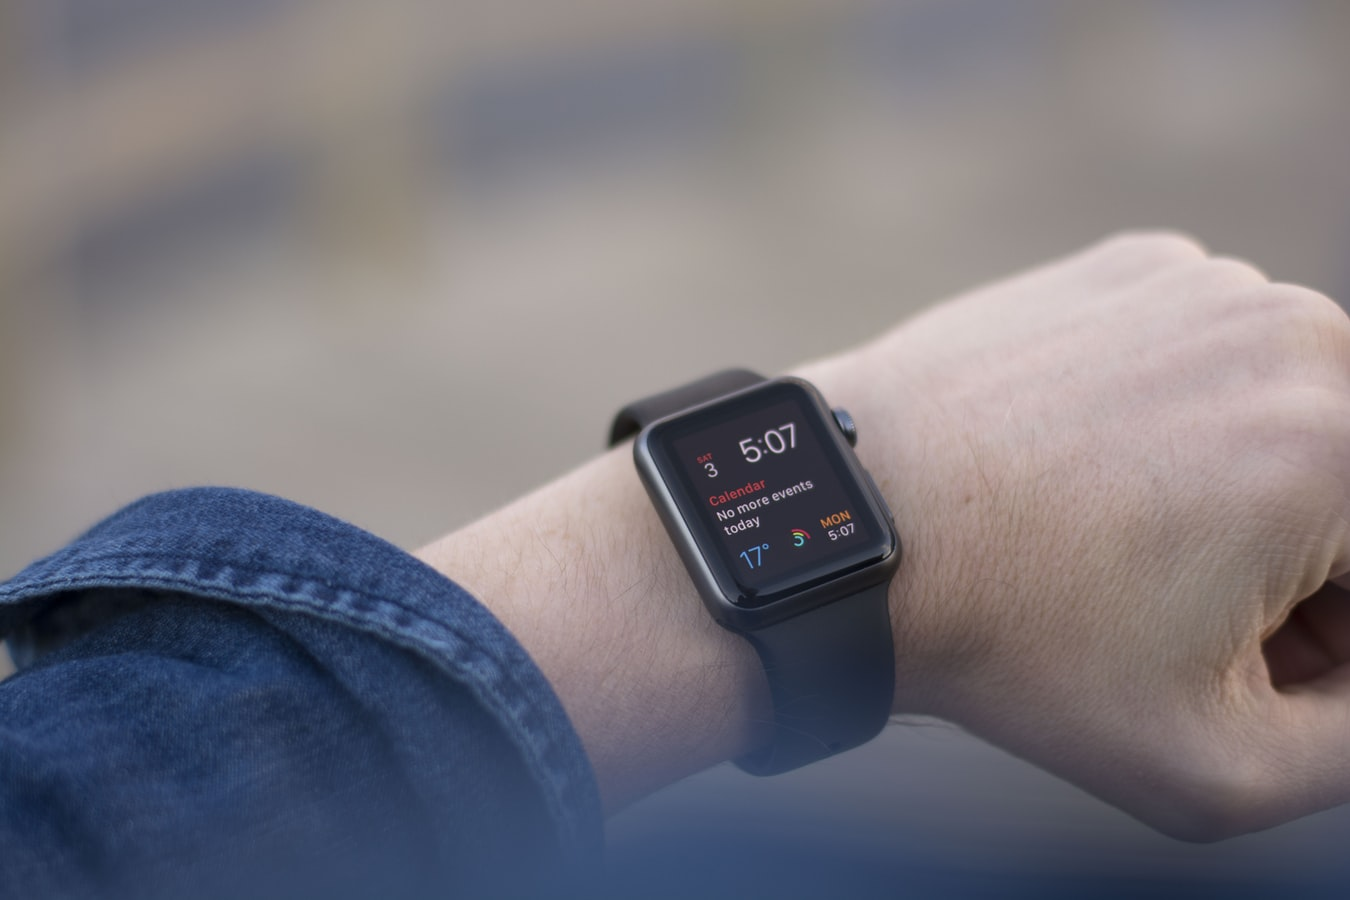 Apple Watch ECG心電圖功能可在台開通! 未來通路需藥商許可執照才能賣